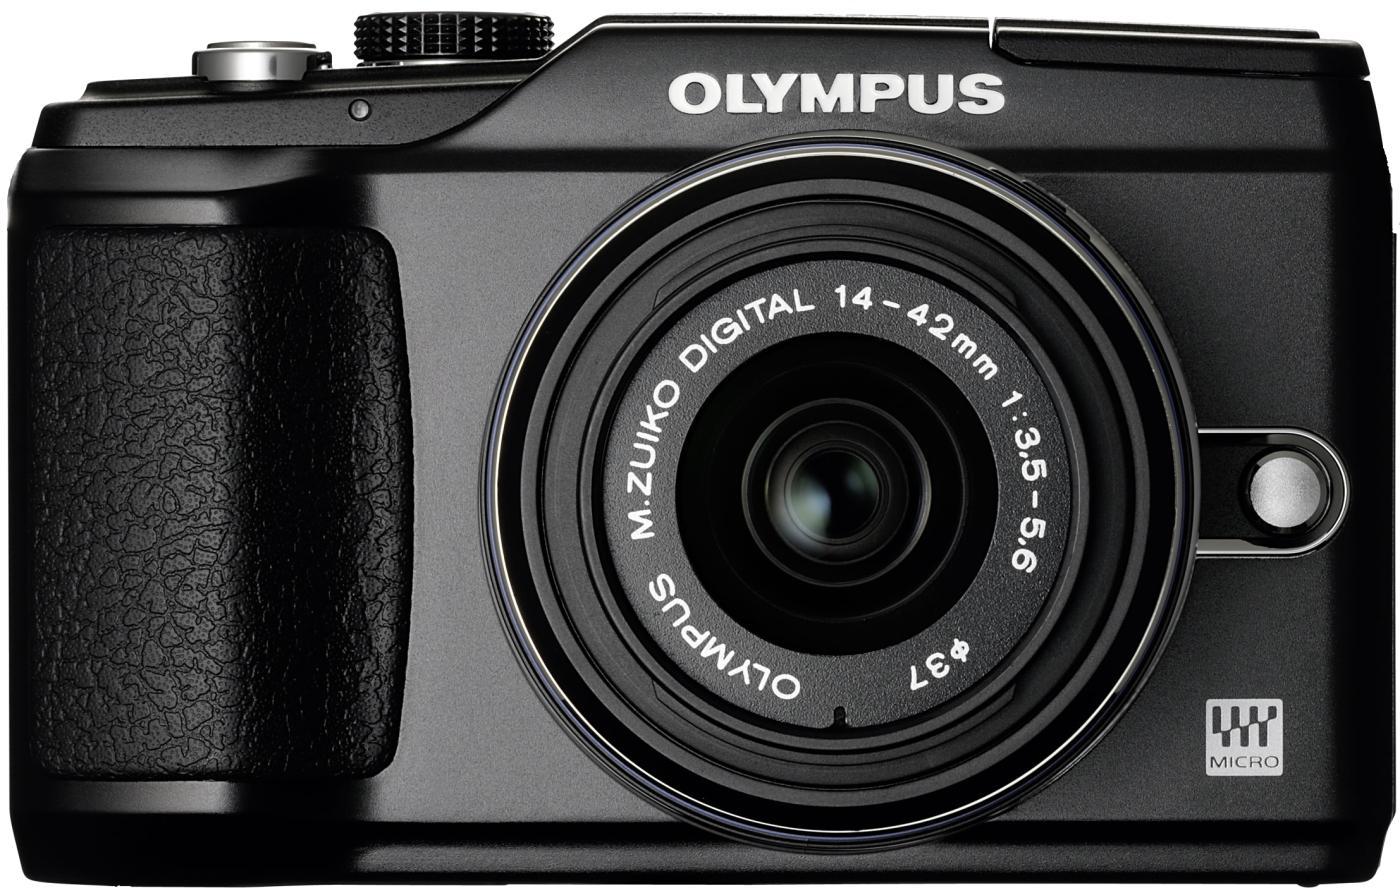 Olympus PEN E-PL2 + M.Zuiko MSC Digital ED m14-42mm f3.5-5.6